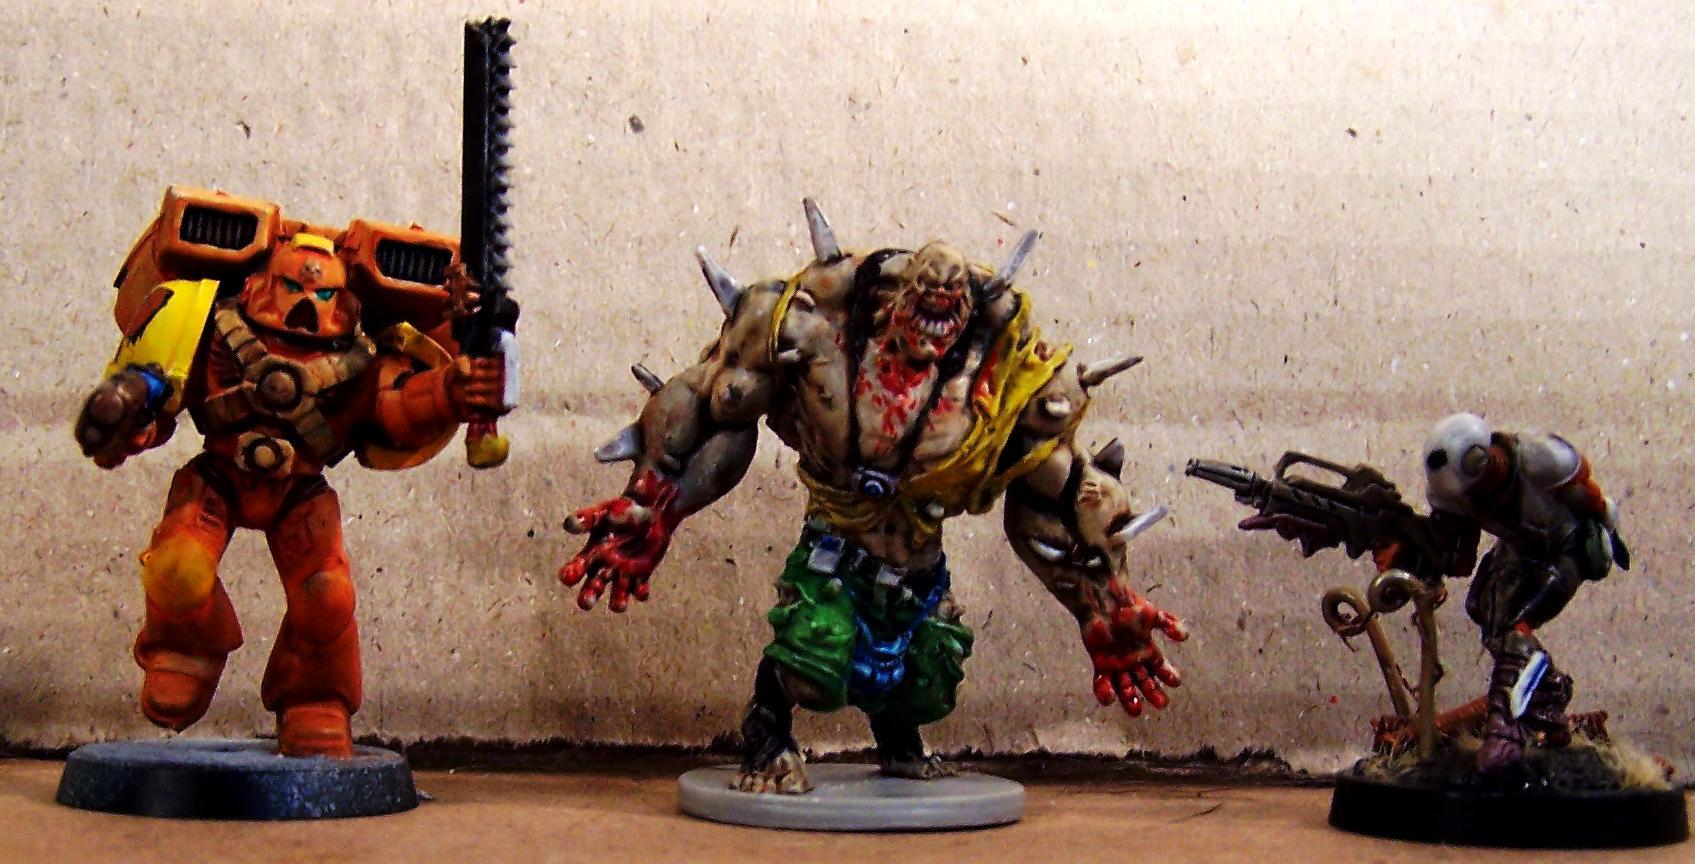 Abomination, Assault Marines, Infinity, Nomad, Zero, Zombicide